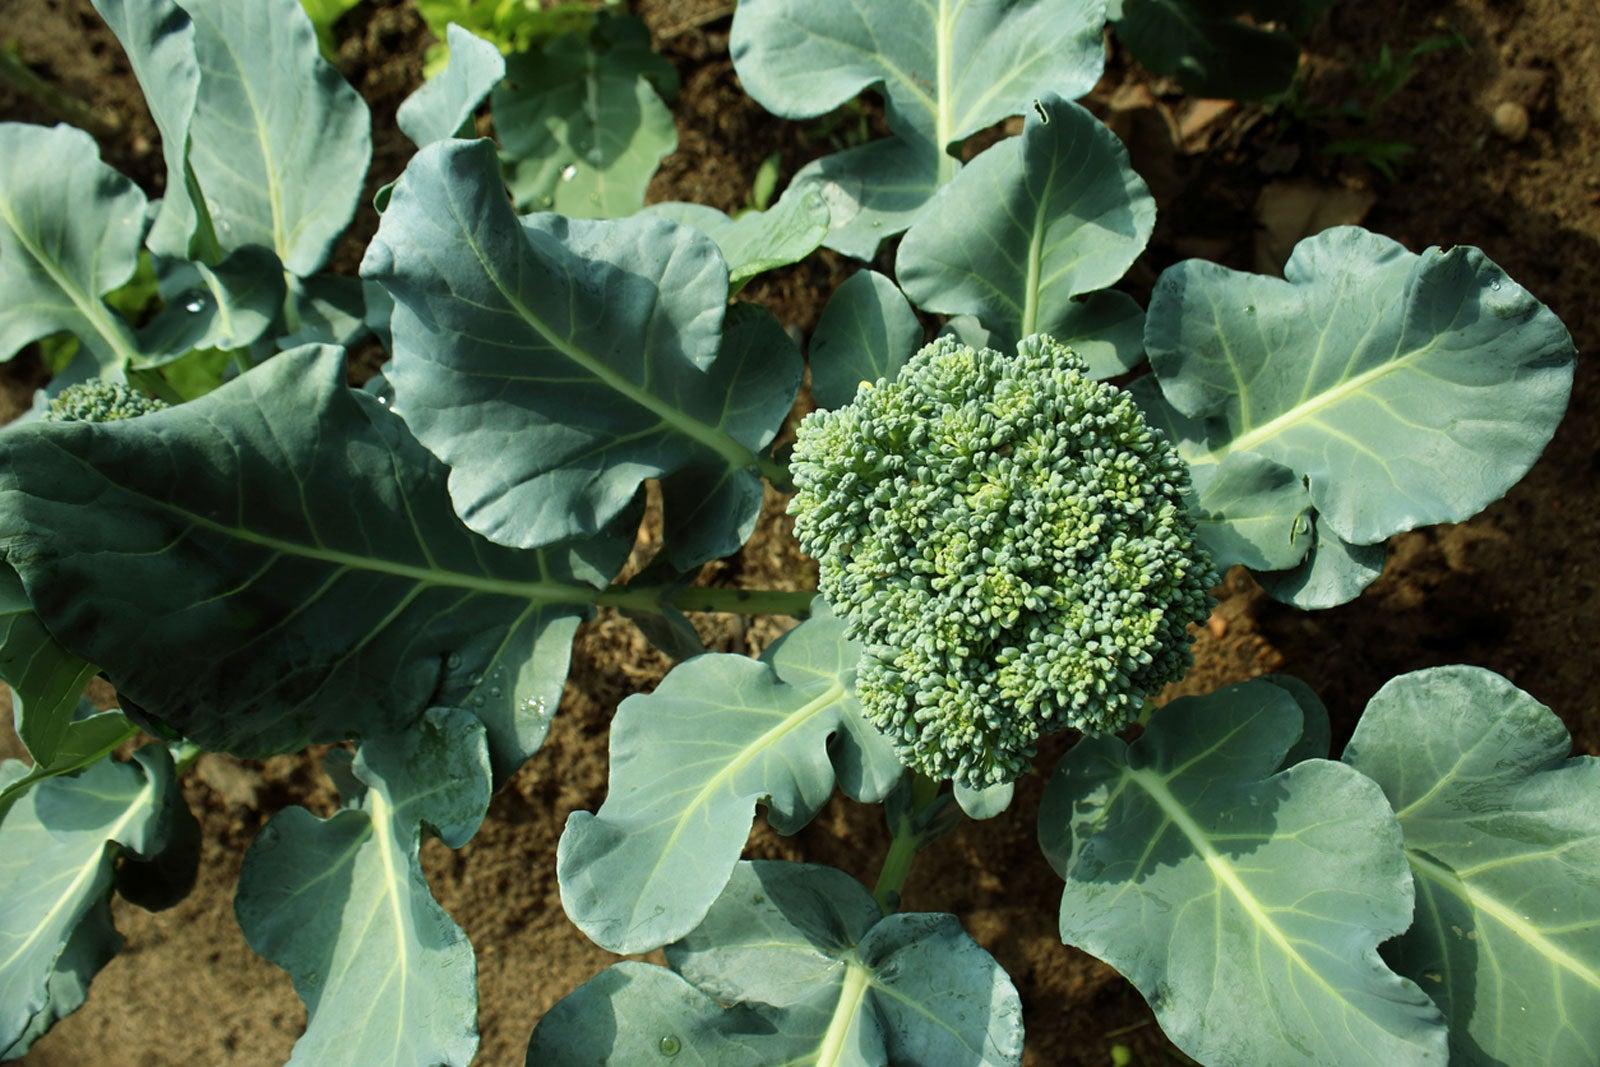 GROW COOK EAT – Broccoli